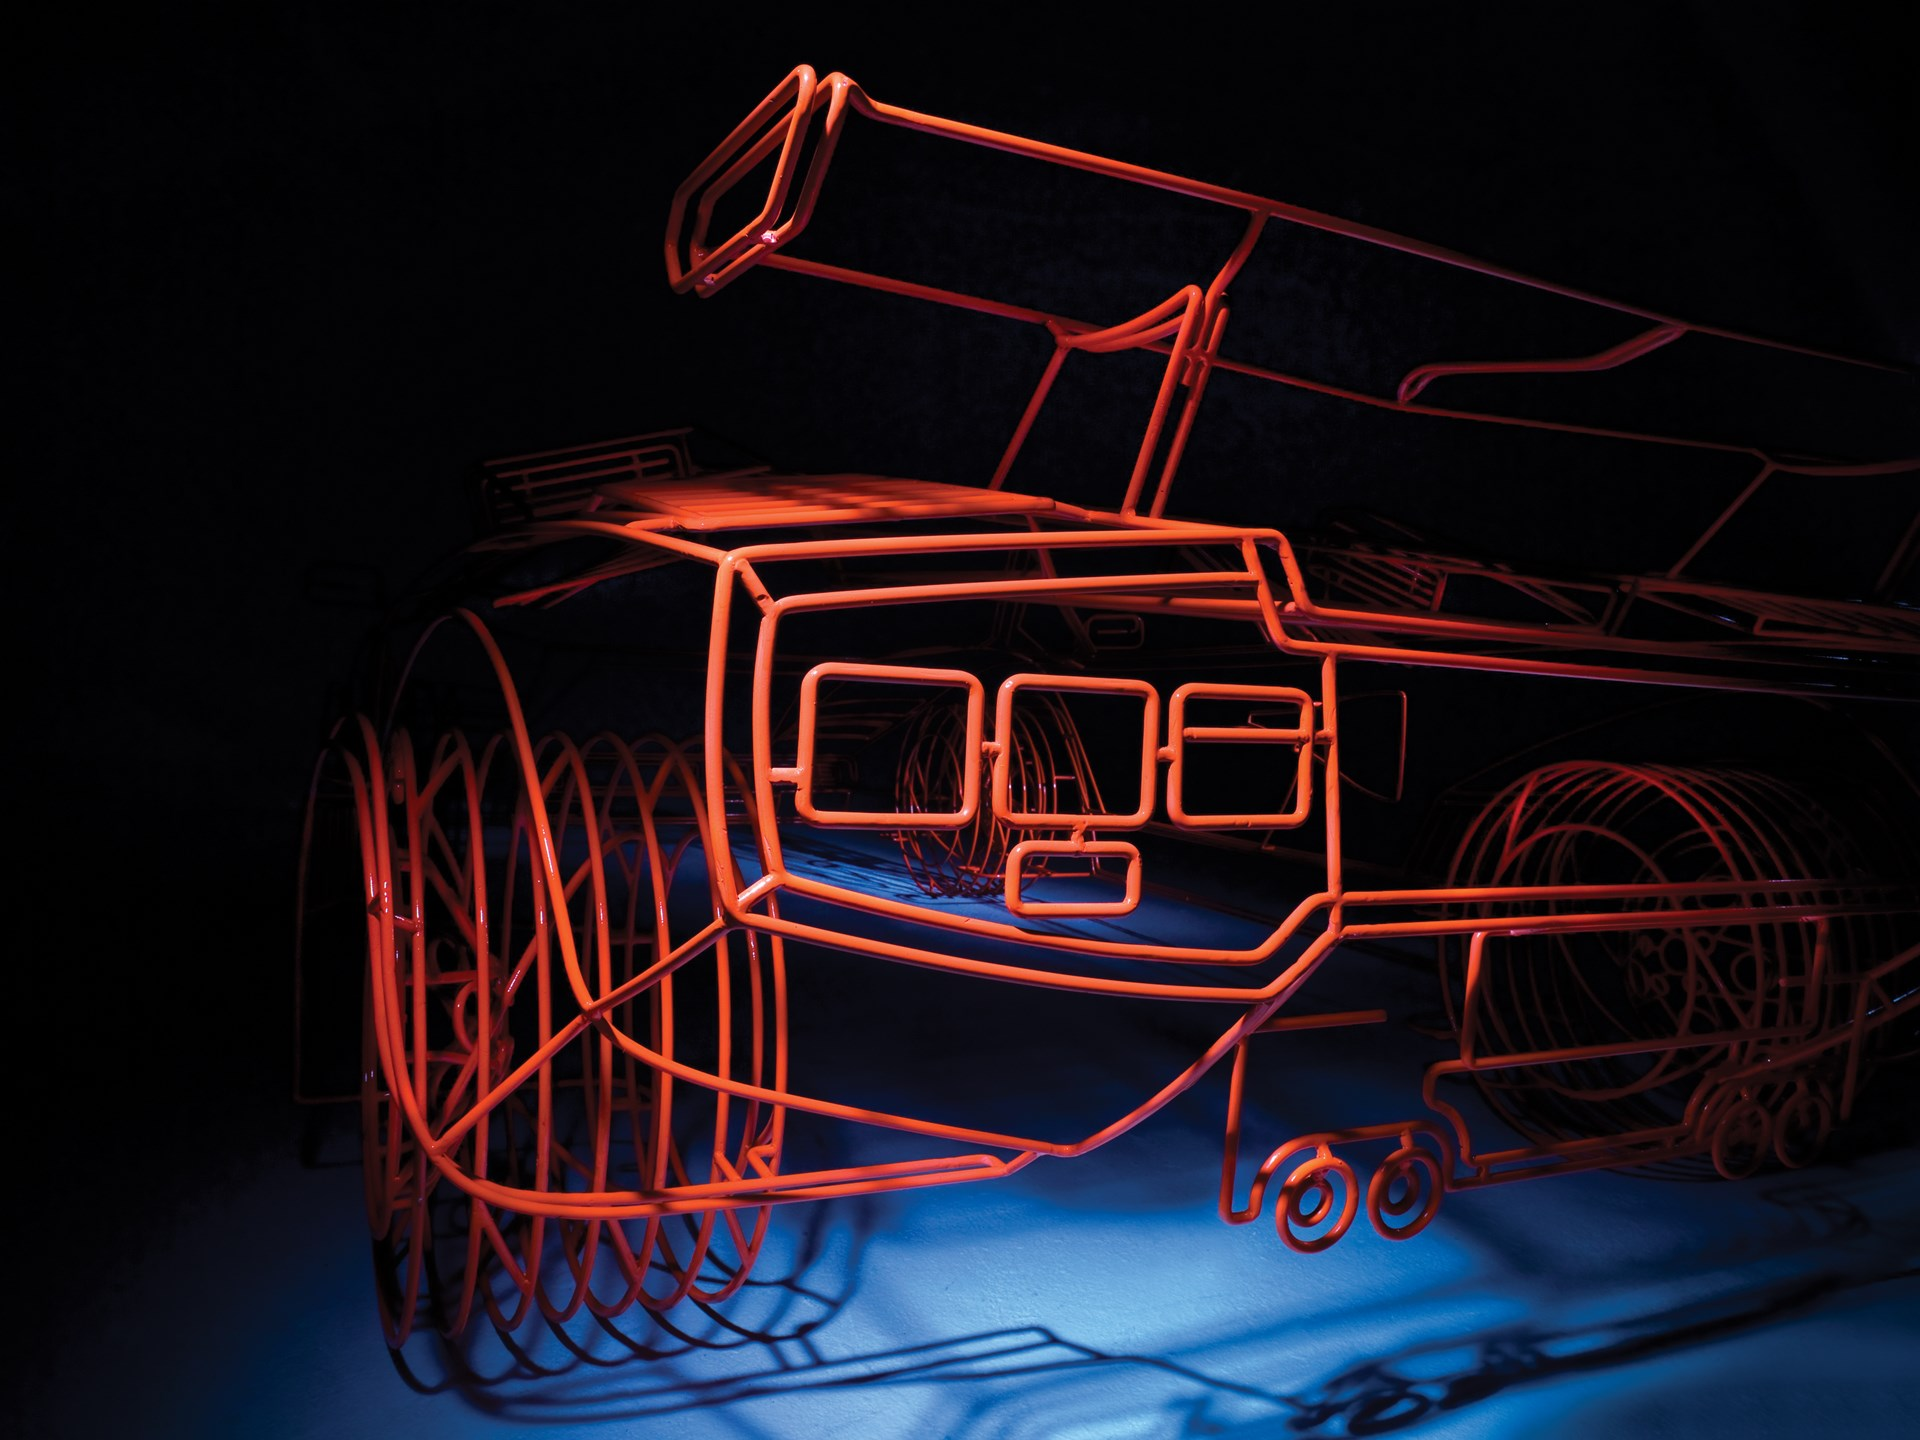 Lamborghini Countach 'Koenig' by Benedict Radcliffe, 2007